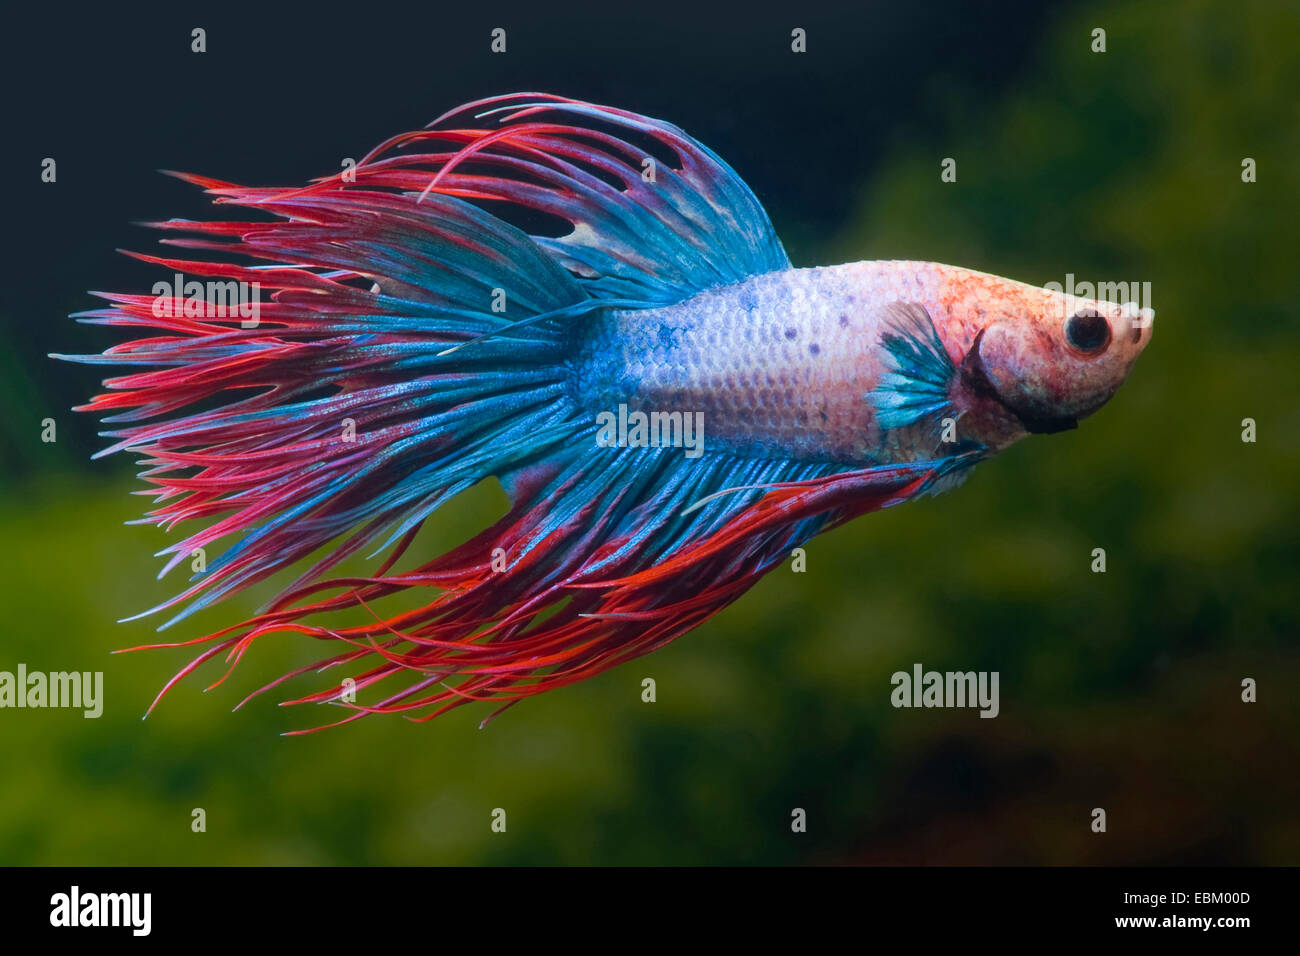 Siamese fighting fish, Siamese fighter (Betta splendens), breed Crown Tail Multicolor - Stock Image